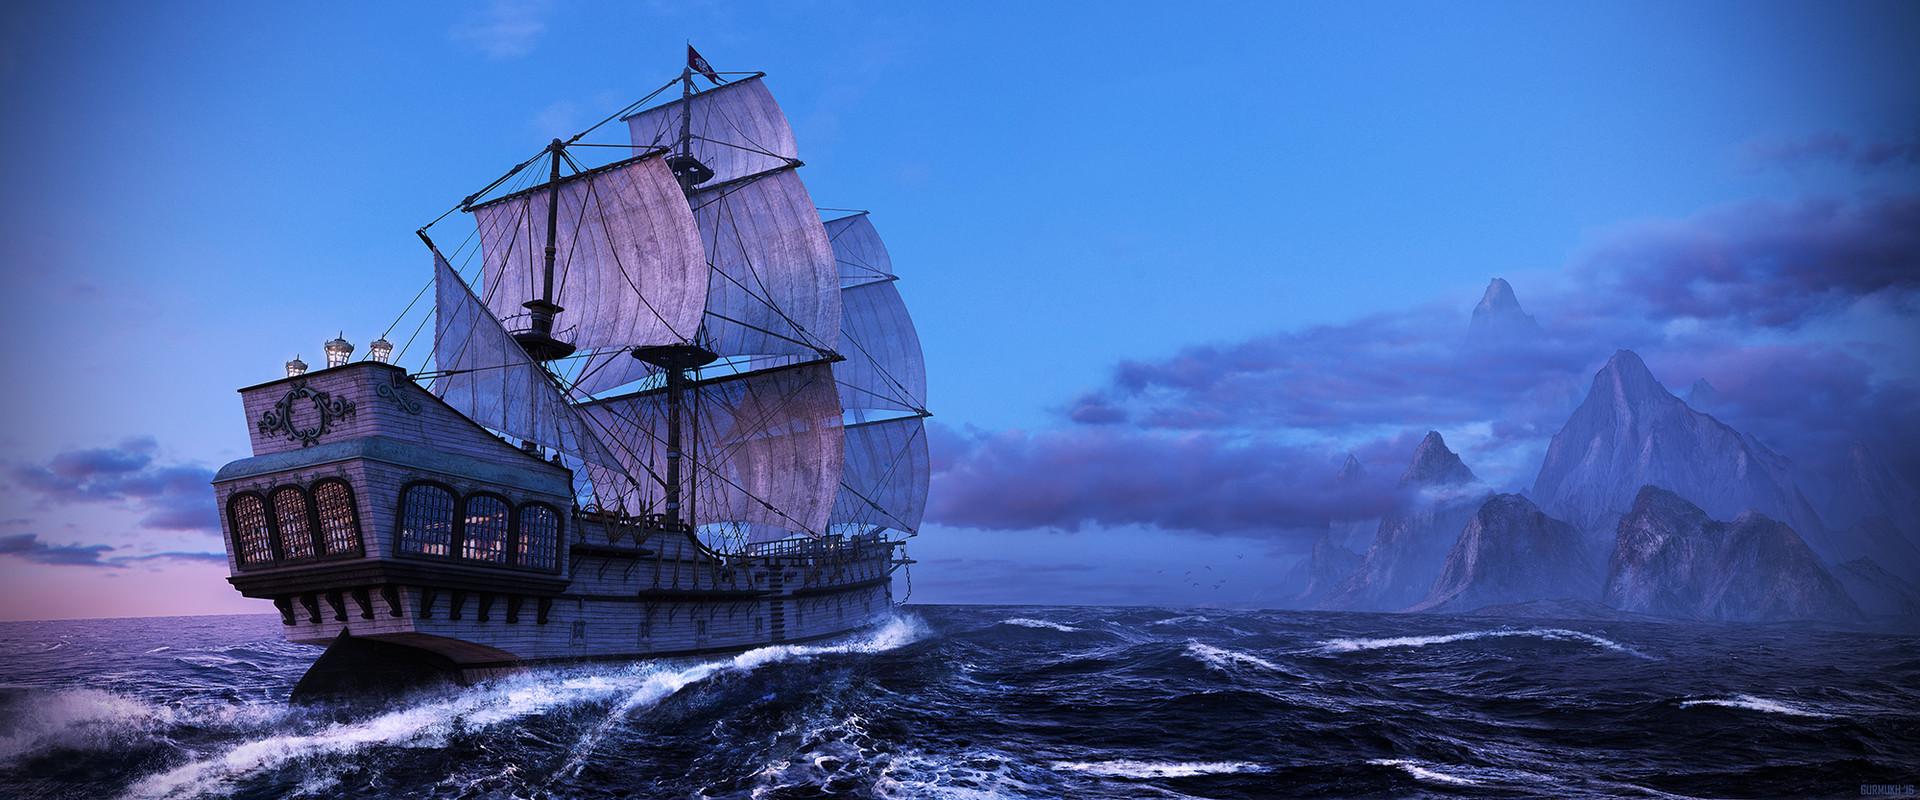 ArtStation - Adventures of a Pirate Ship, gurmukh bhasin